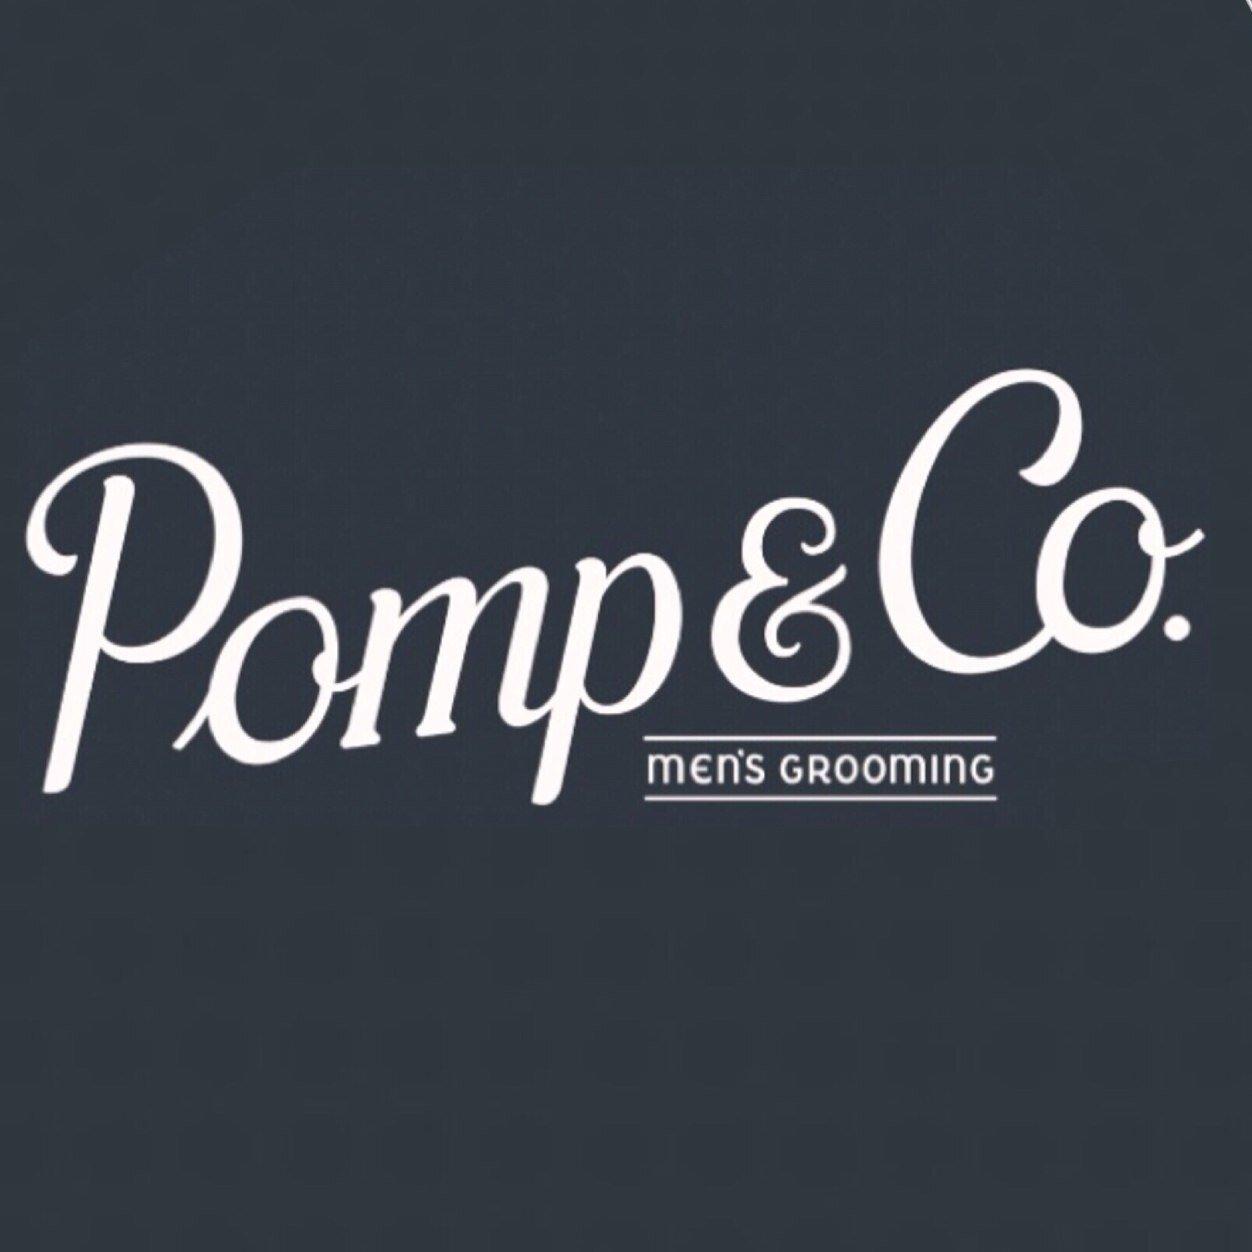 Pomp & Co